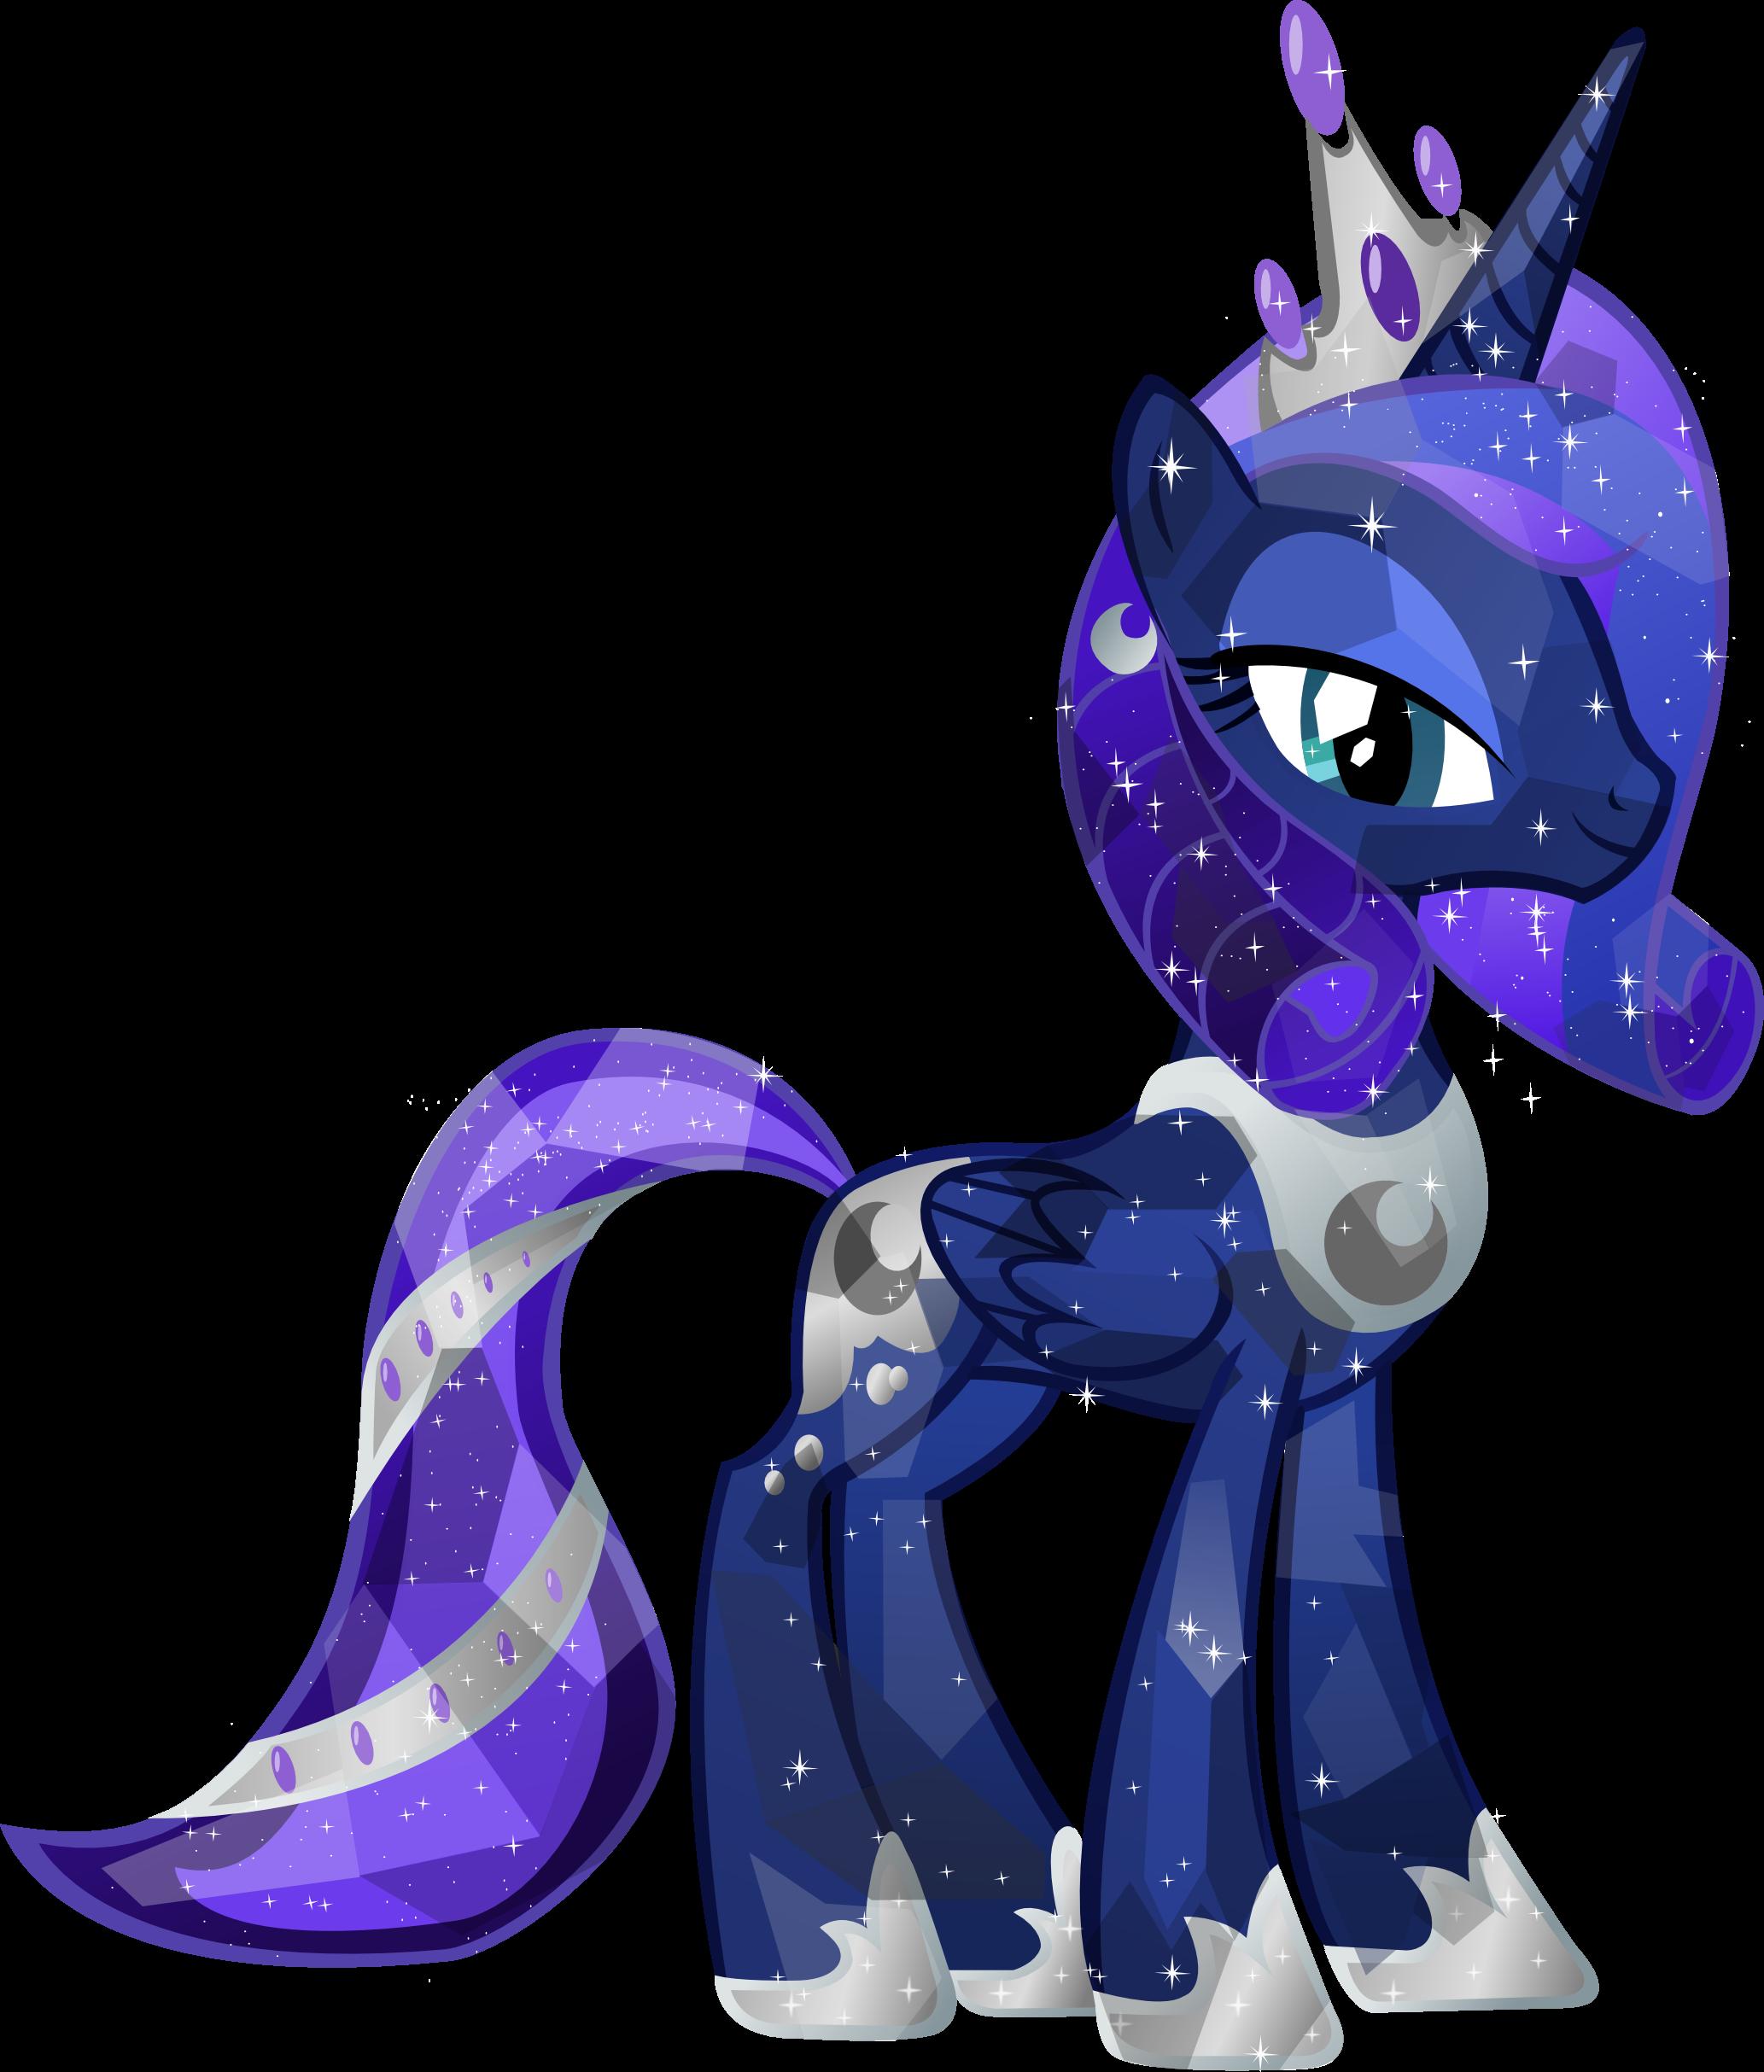 Image princess luna png. Clipart ruler crystal